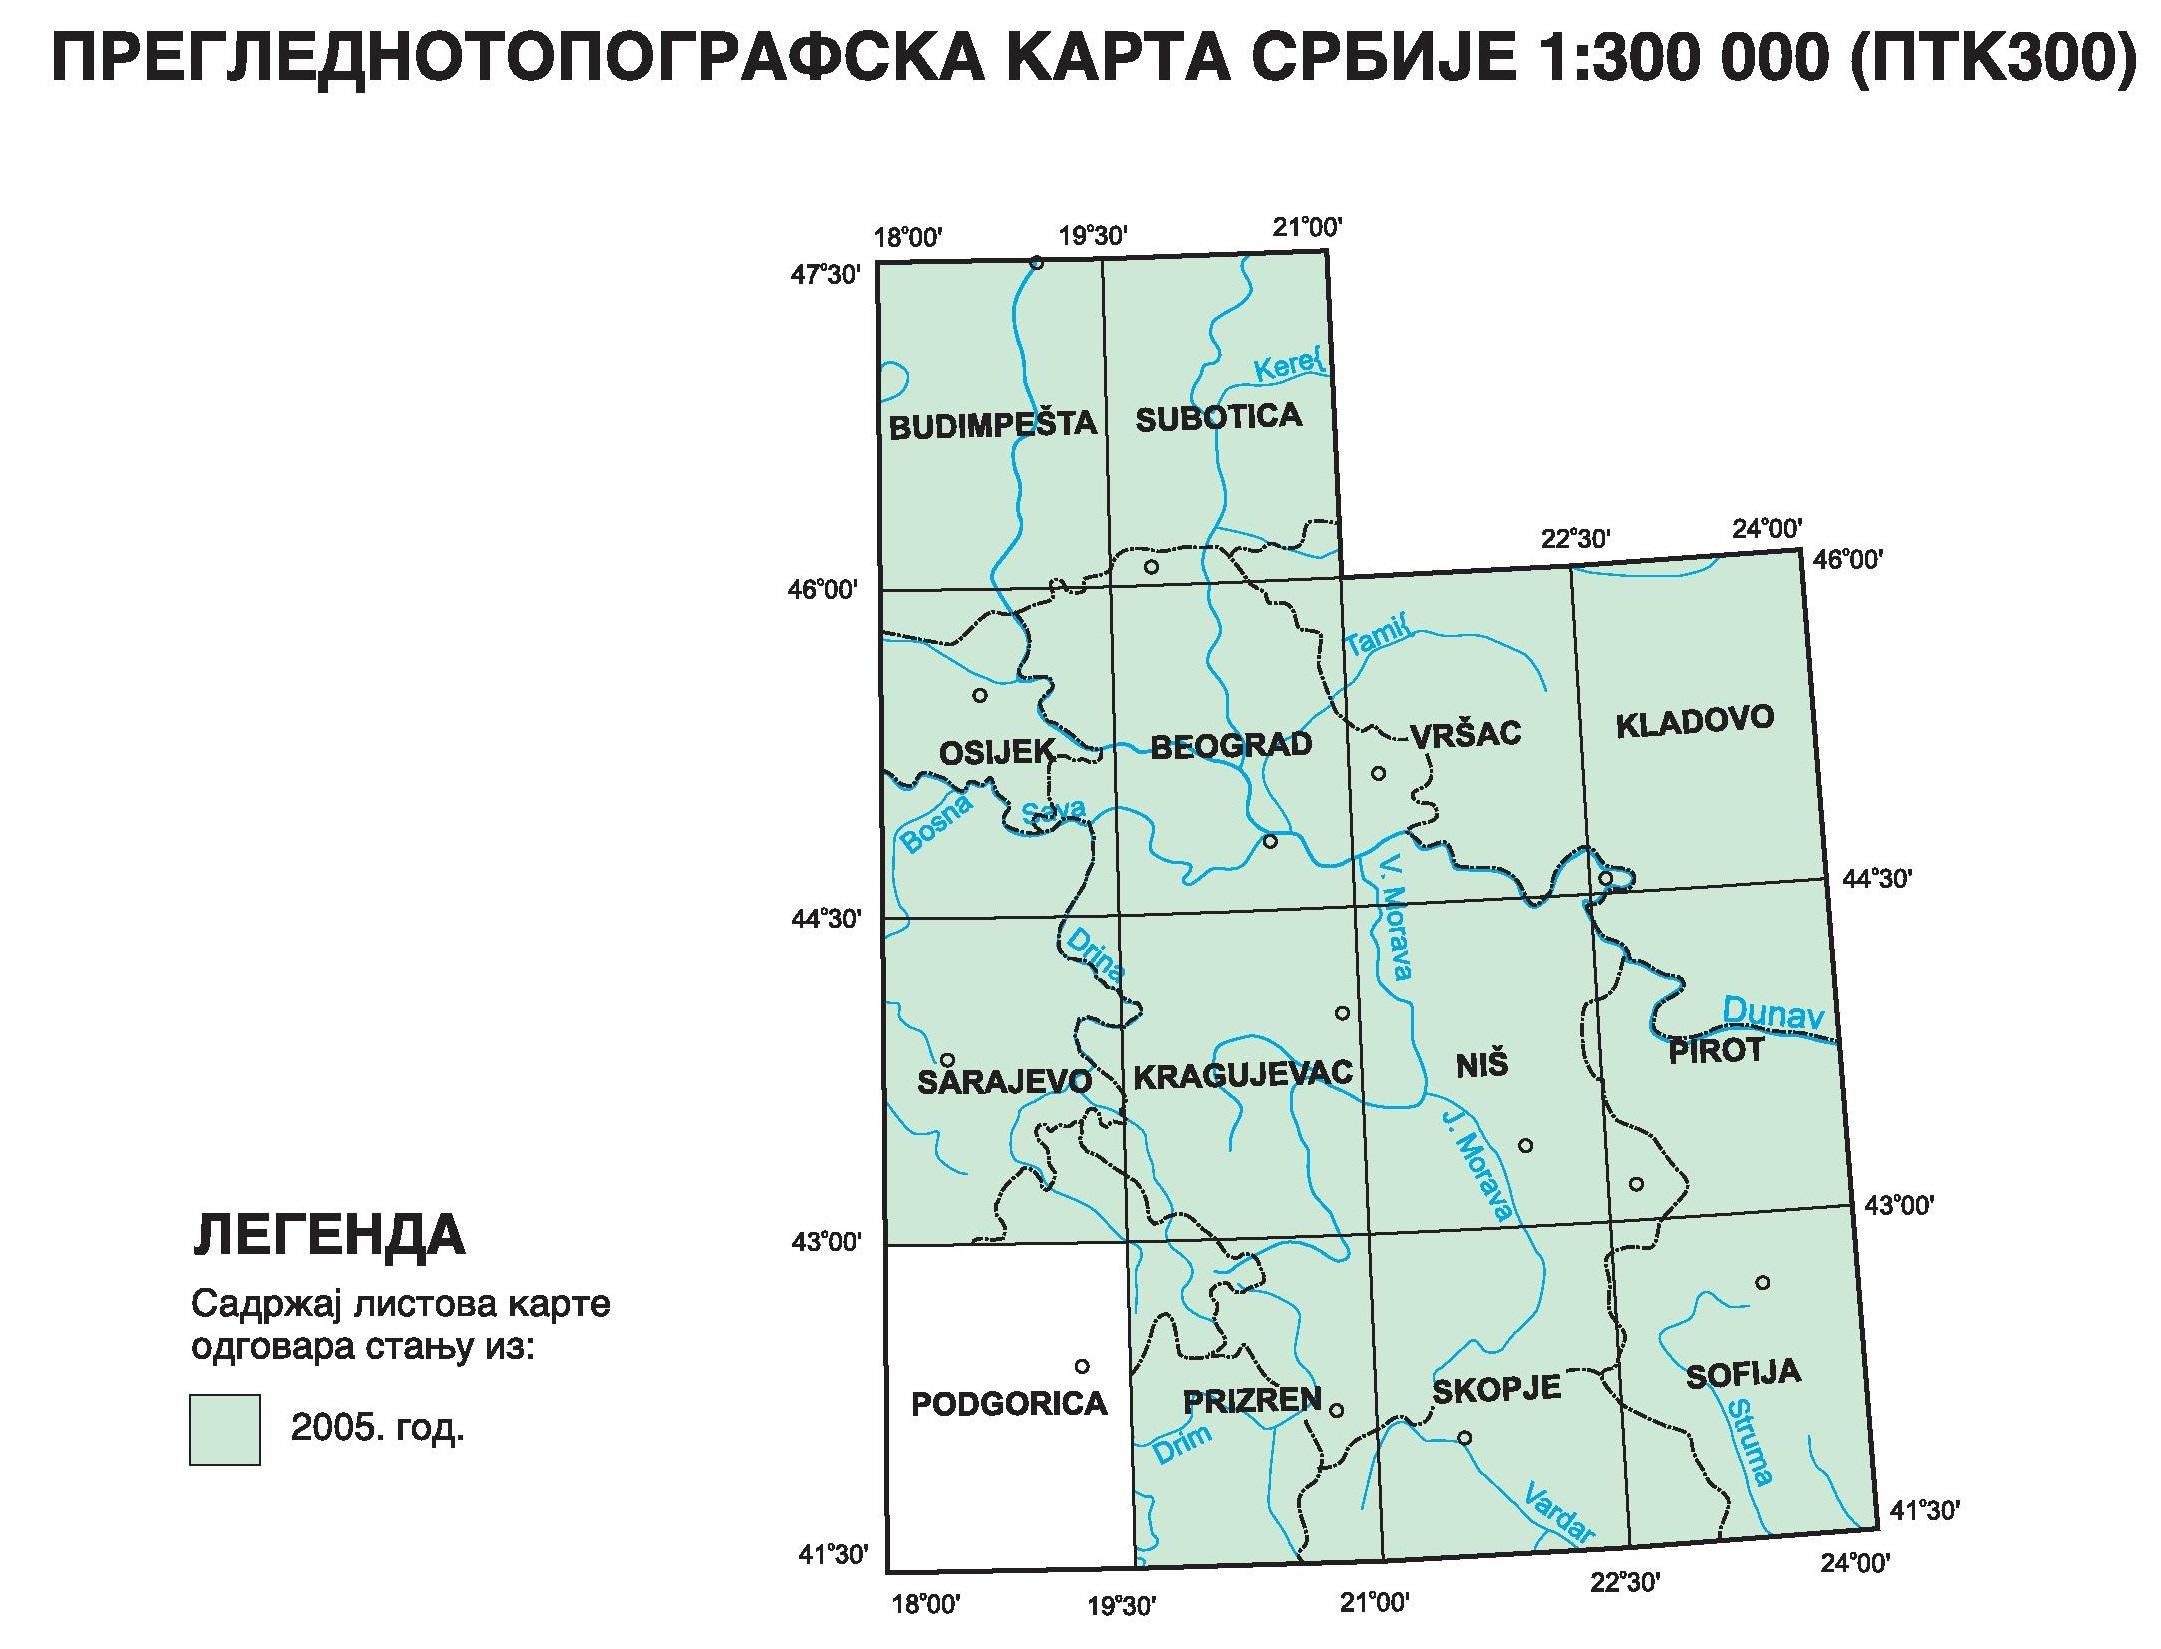 Preglednotopografska karta 1:300 000 (PTK300)